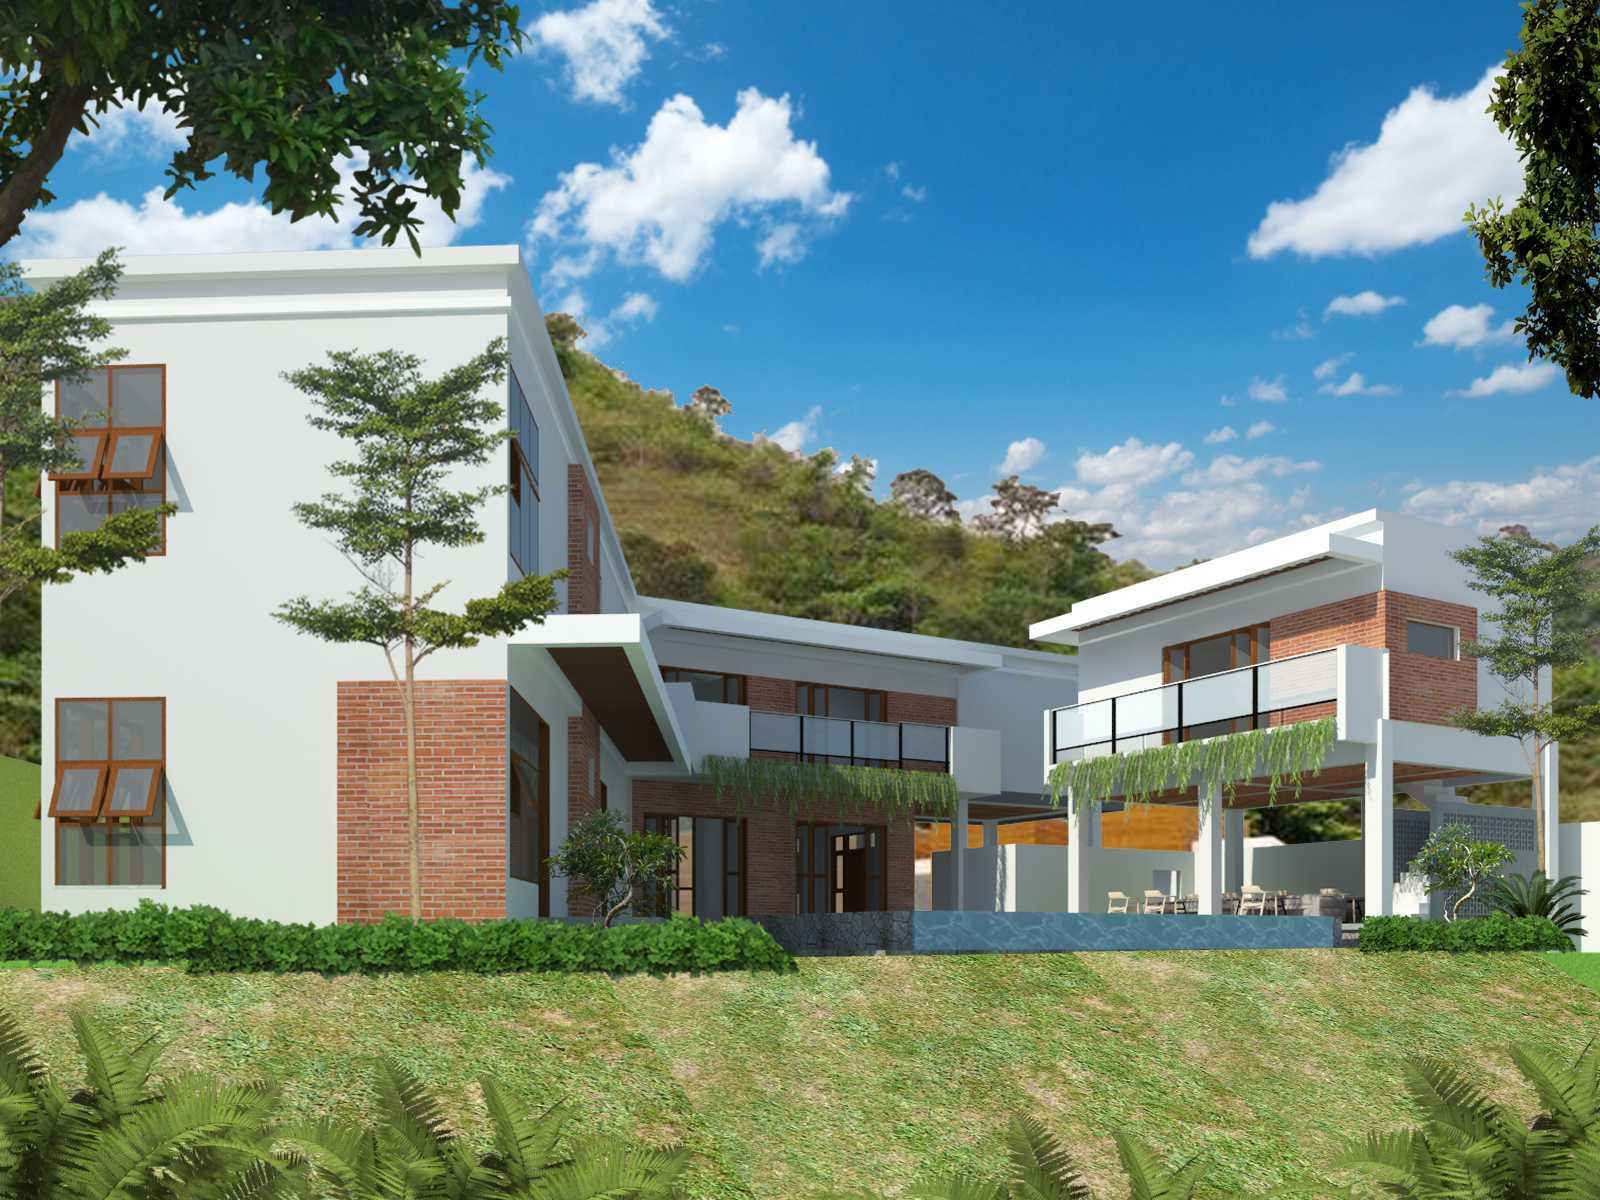 Epicnesia Architect Villa Mahabali Kediri, Kabupaten Tabanan, Bali, Indonesia Kediri, Kabupaten Tabanan, Bali, Indonesia Aditya-Yuni-Prasetya-Villa-Mahabali  68052